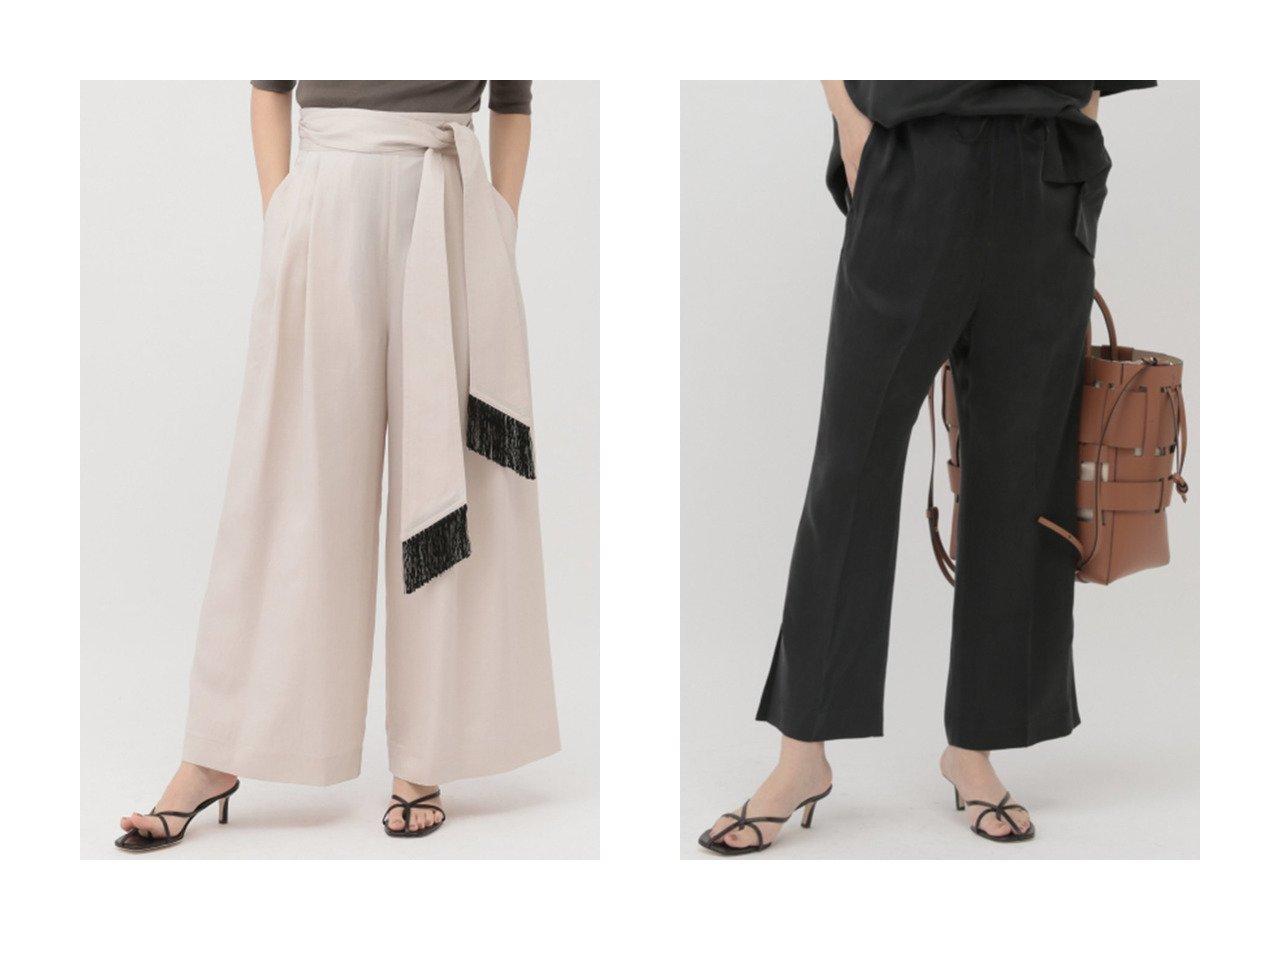 【Chaos/カオス】のフリソルワイドパンツ&リオンサンドパンツ パンツのおすすめ!人気、トレンド・レディースファッションの通販 おすすめで人気の流行・トレンド、ファッションの通販商品 メンズファッション・キッズファッション・インテリア・家具・レディースファッション・服の通販 founy(ファニー) https://founy.com/ ファッション Fashion レディースファッション WOMEN パンツ Pants 2021年 2021 2021 春夏 S/S SS Spring/Summer 2021 S/S 春夏 SS Spring/Summer ドレープ フリンジ フレア リボン ワイド 春 Spring |ID:crp329100000015270